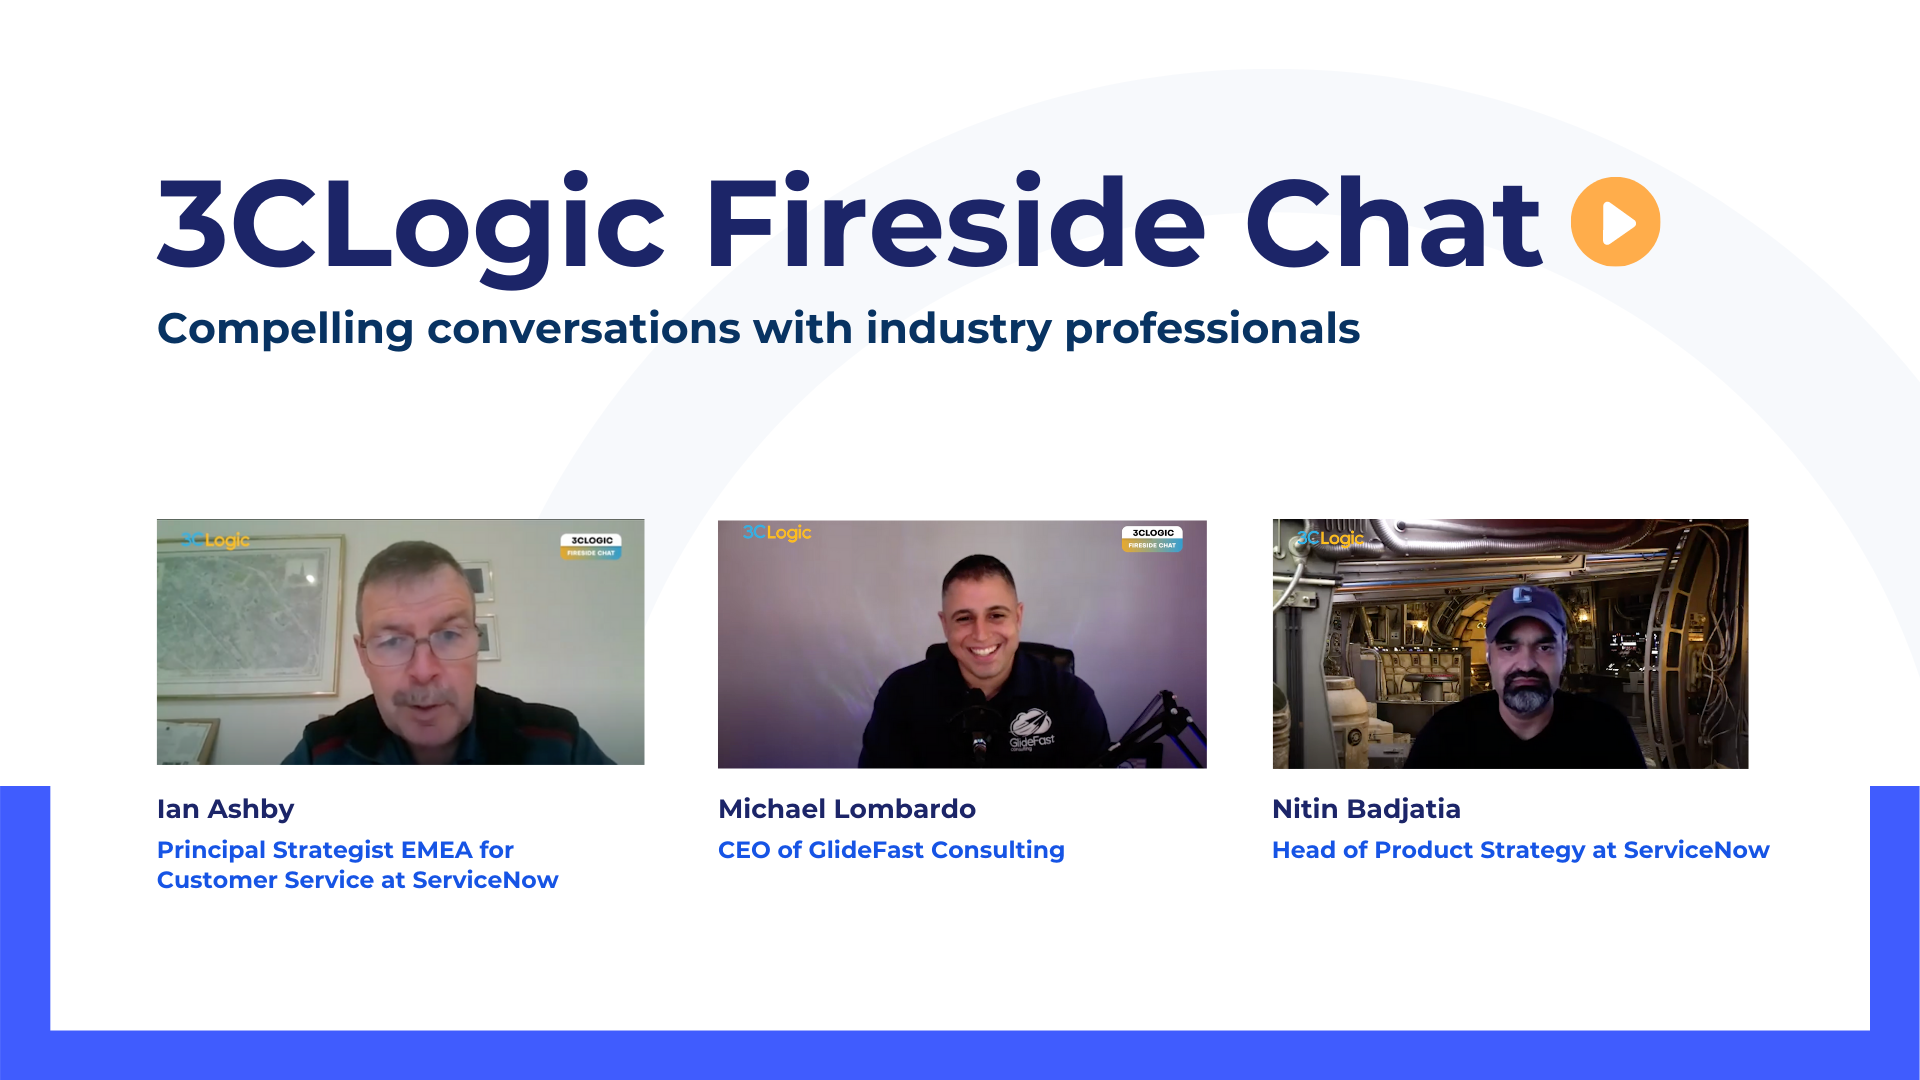 3C Logic - Fireside Chat